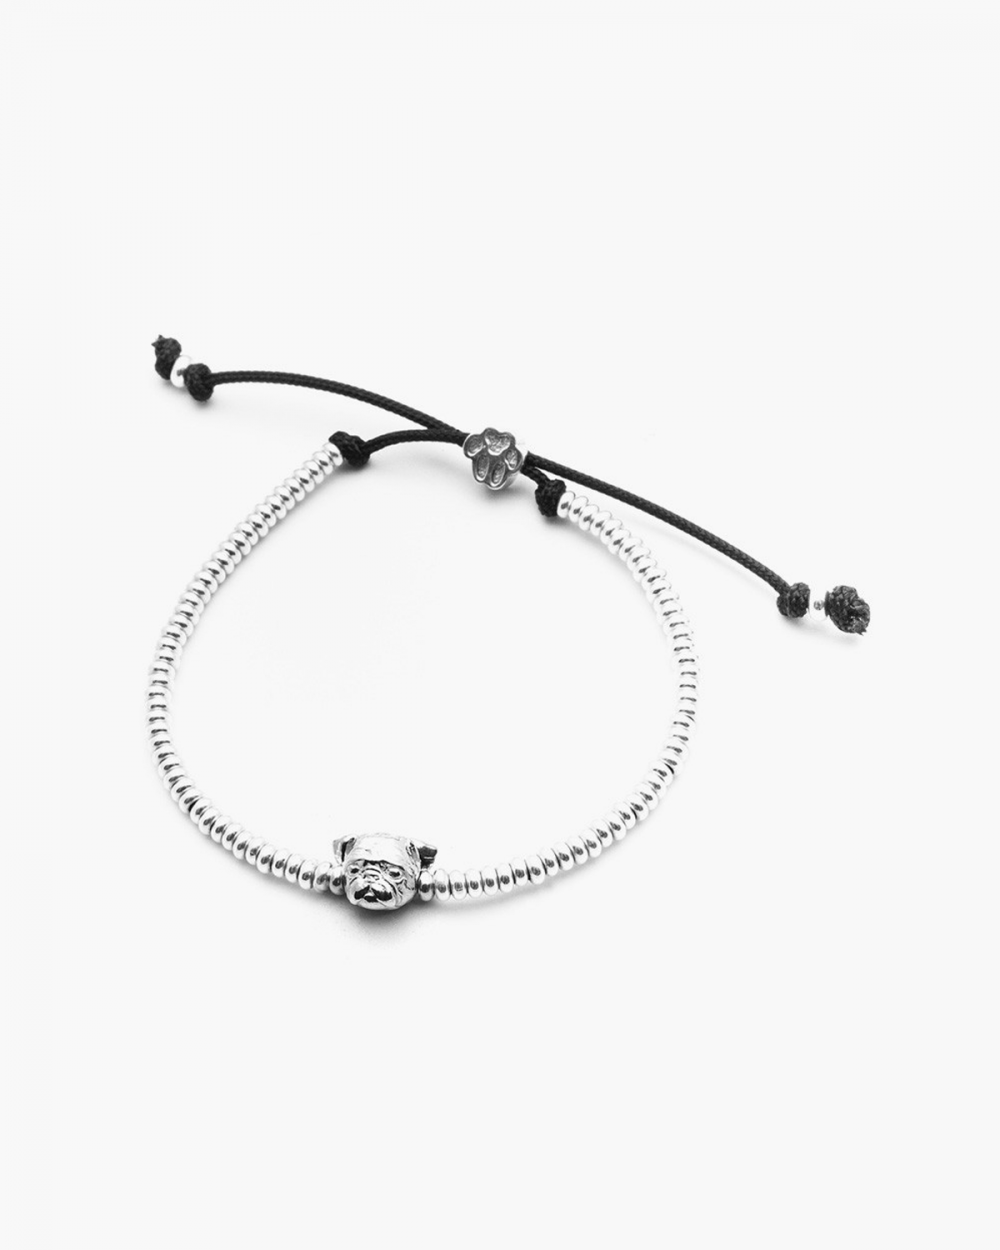 pug snout bracelet polished silver